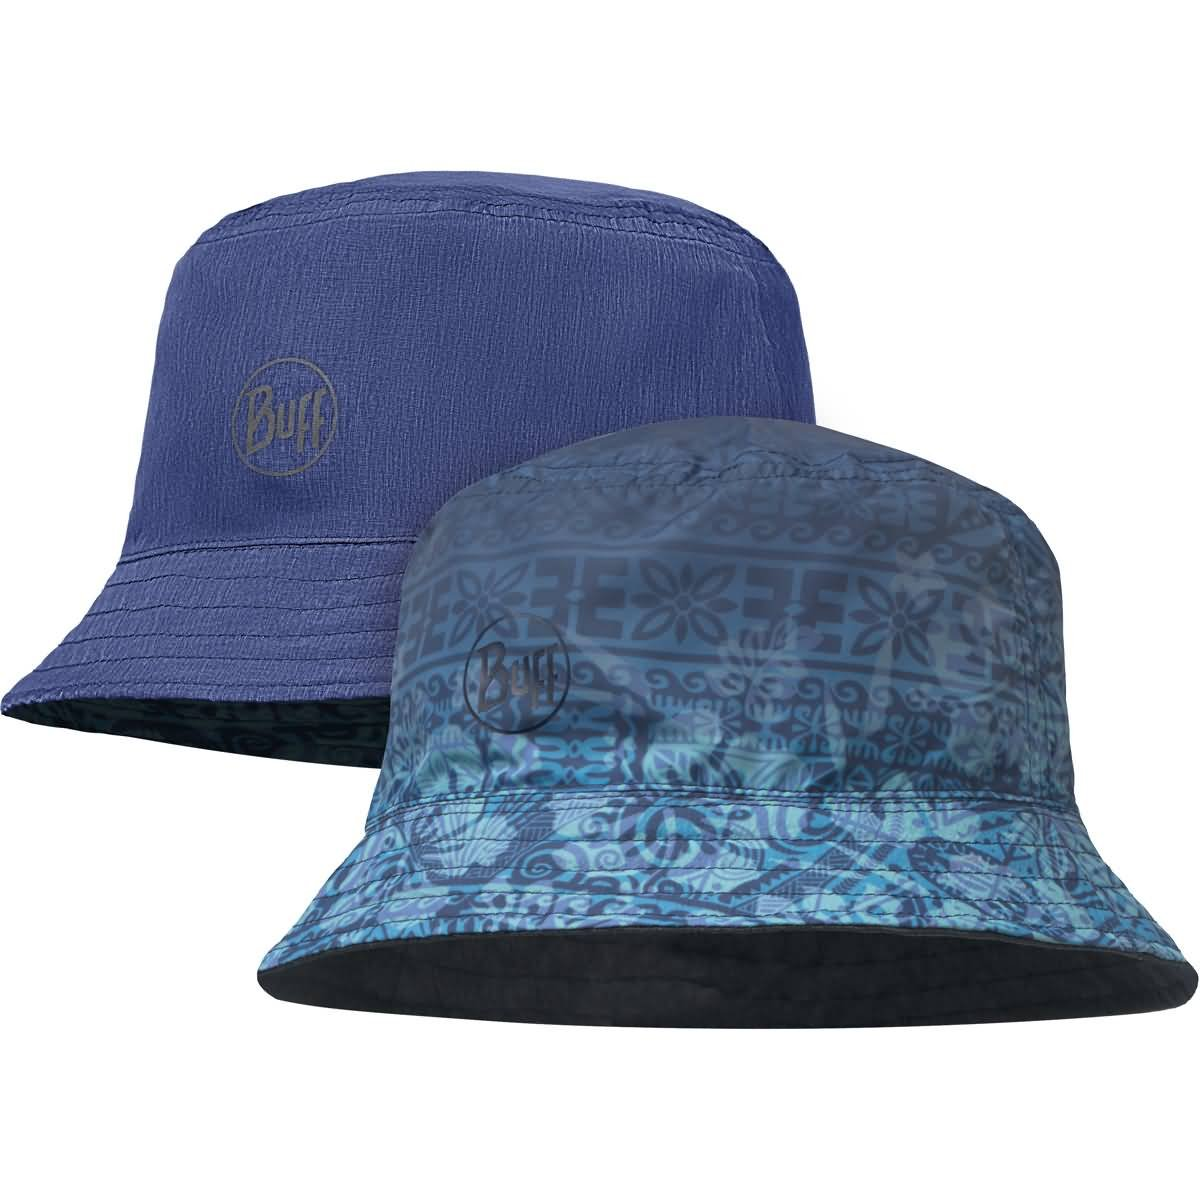 d159bb27afa85 Buff Bucket Hats